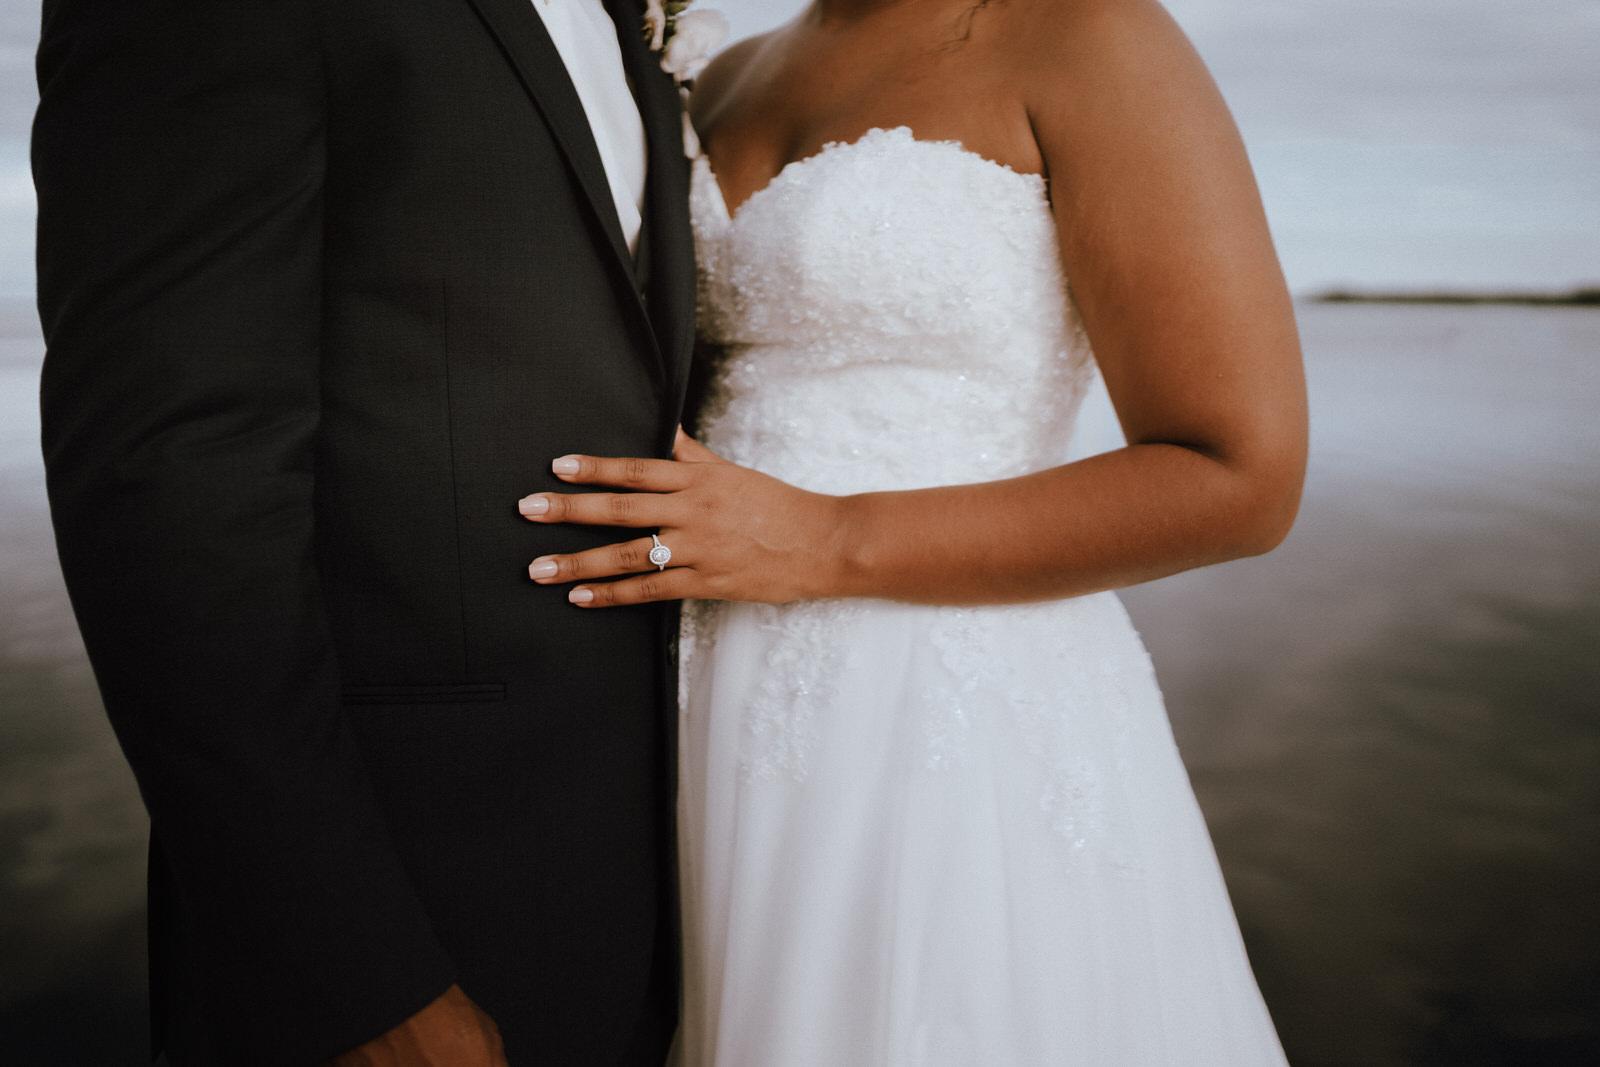 South Seas Island Resort Elopement- Alyana and Shawn- Michelle Gonzalez Photography-387.JPG